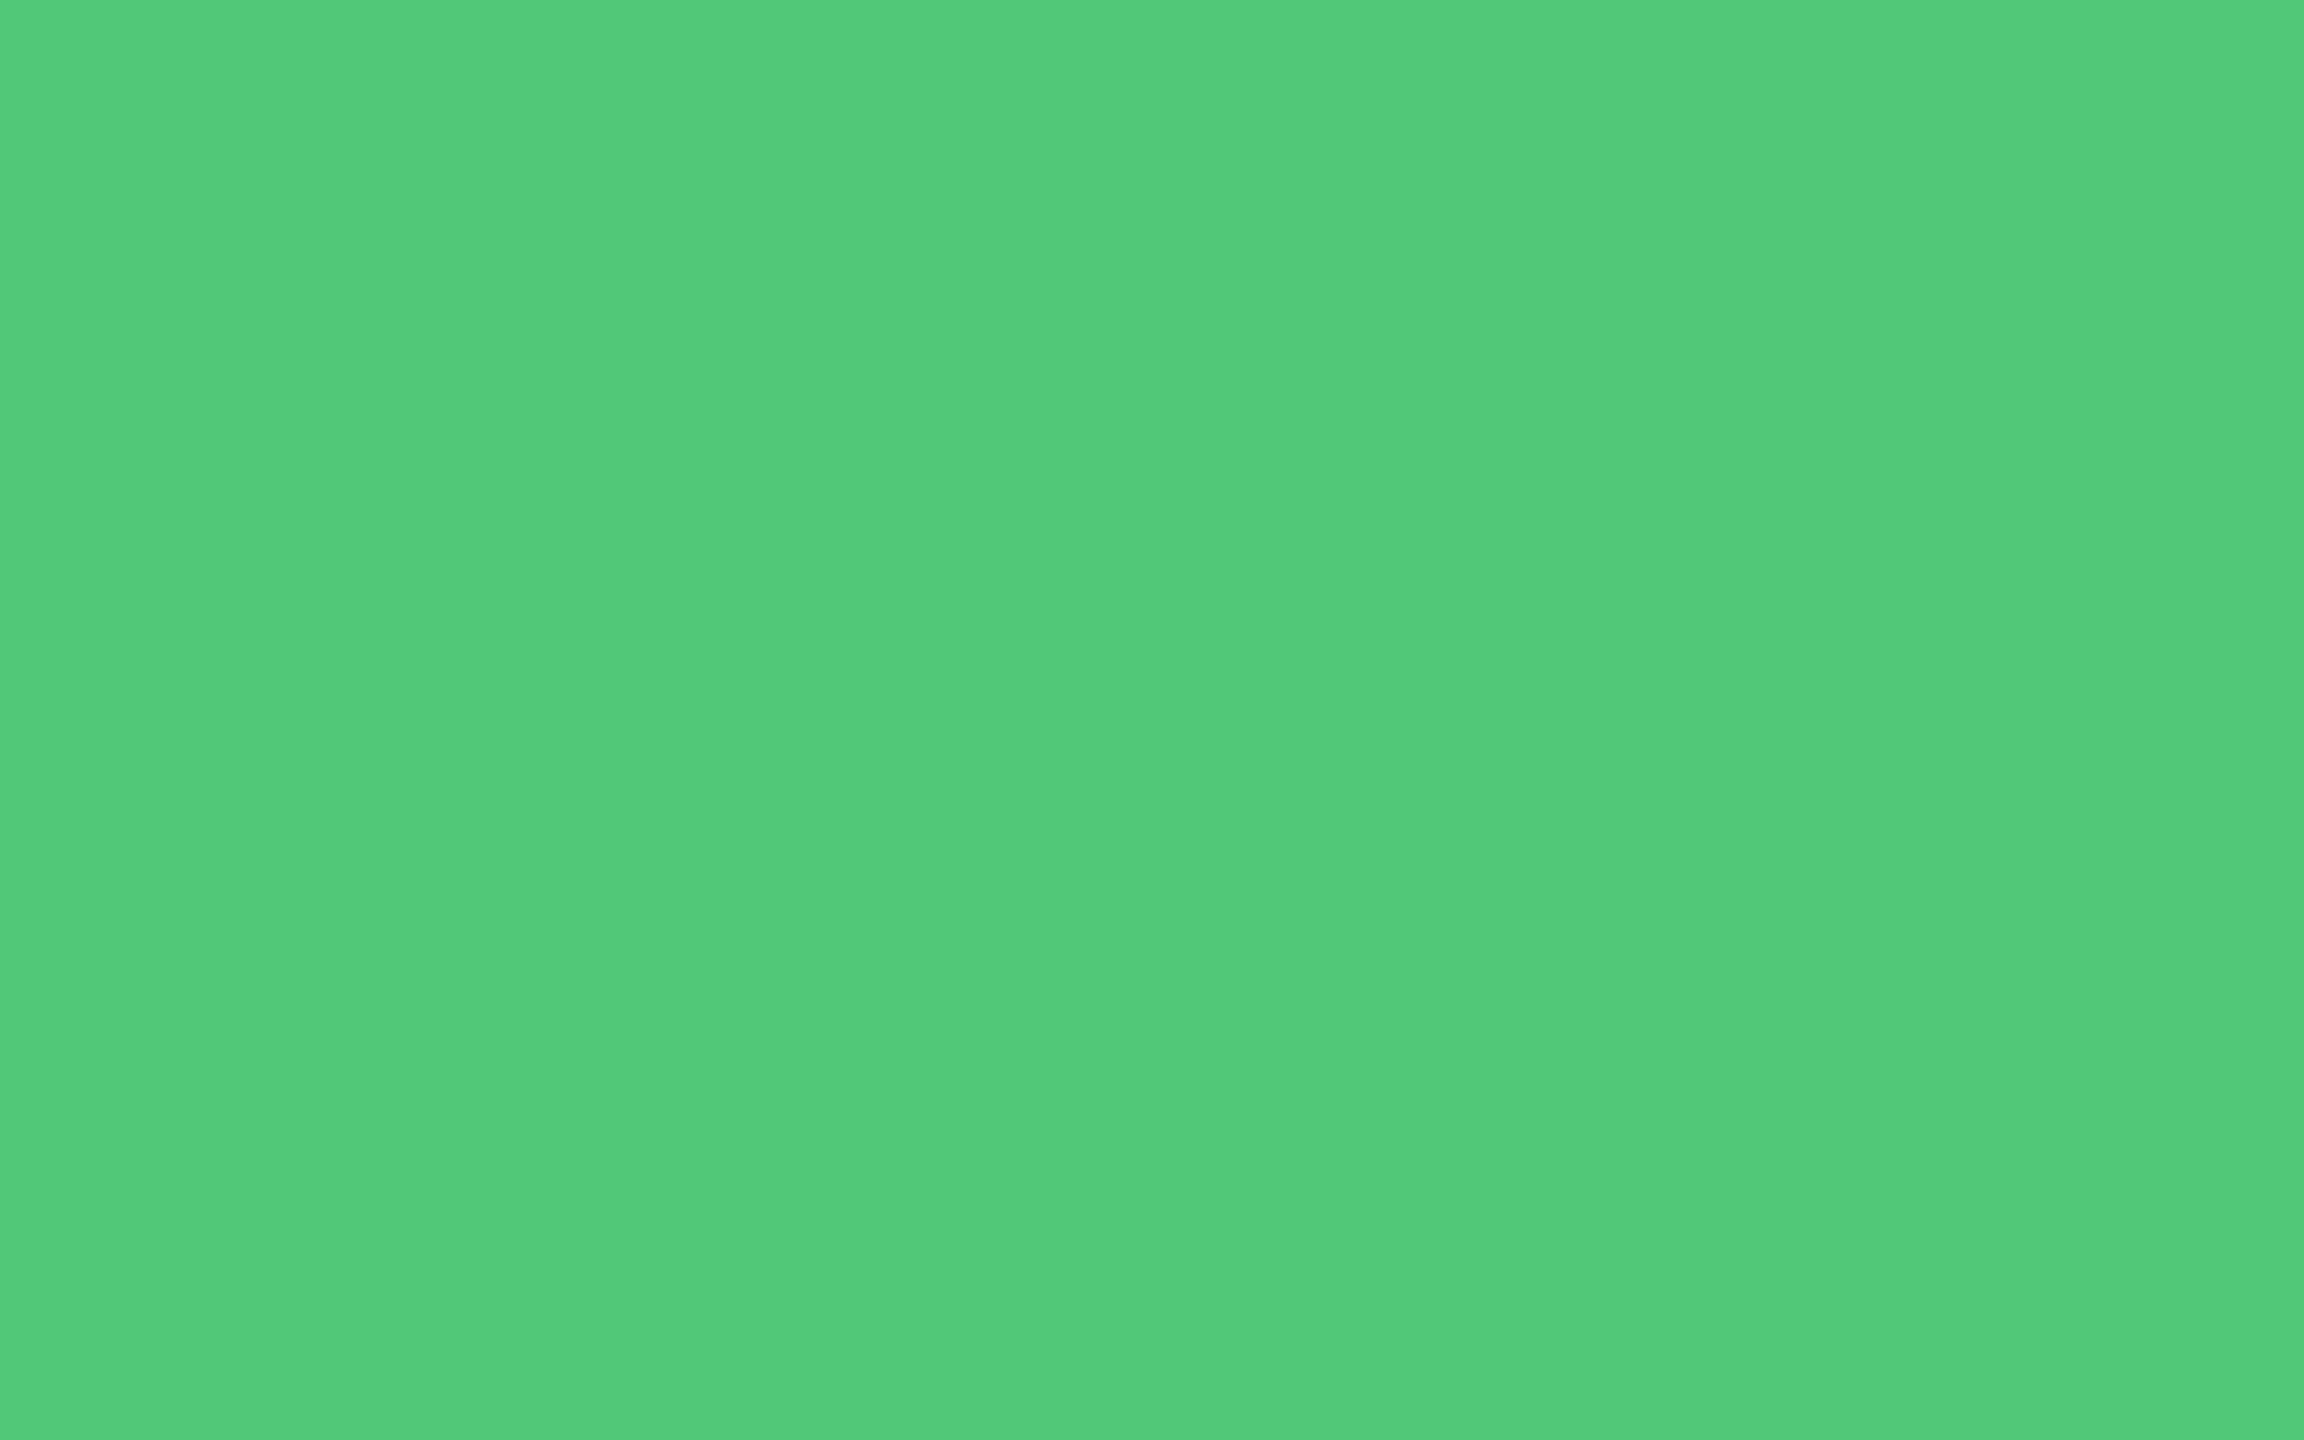 2304x1440 Paris Green Solid Color Background